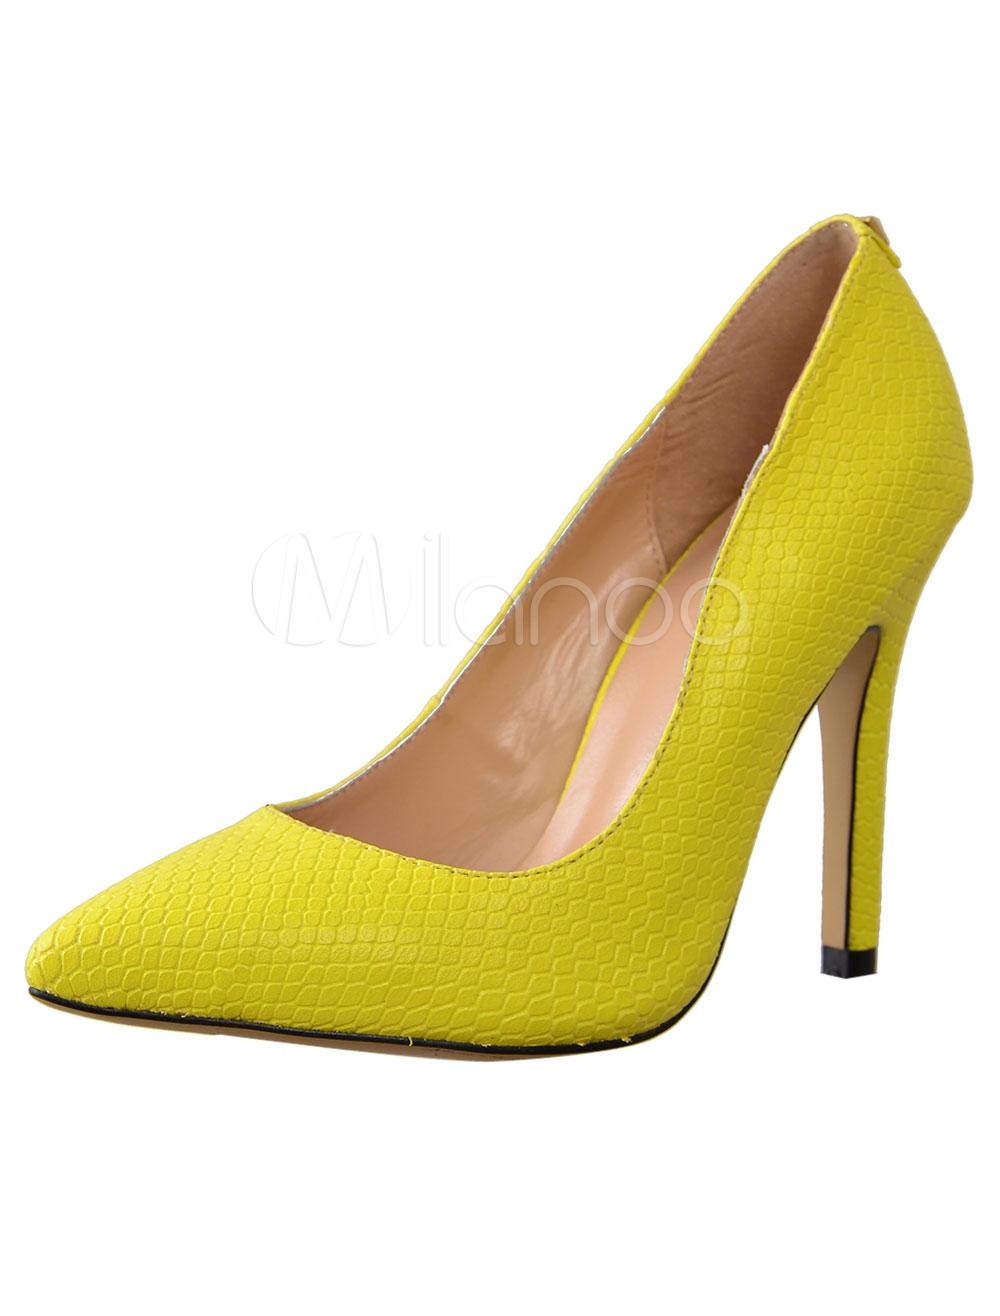 Yellow Fish Print Sheepskin Pretty Womens Pointy Toe Heels  - Milanoo.com